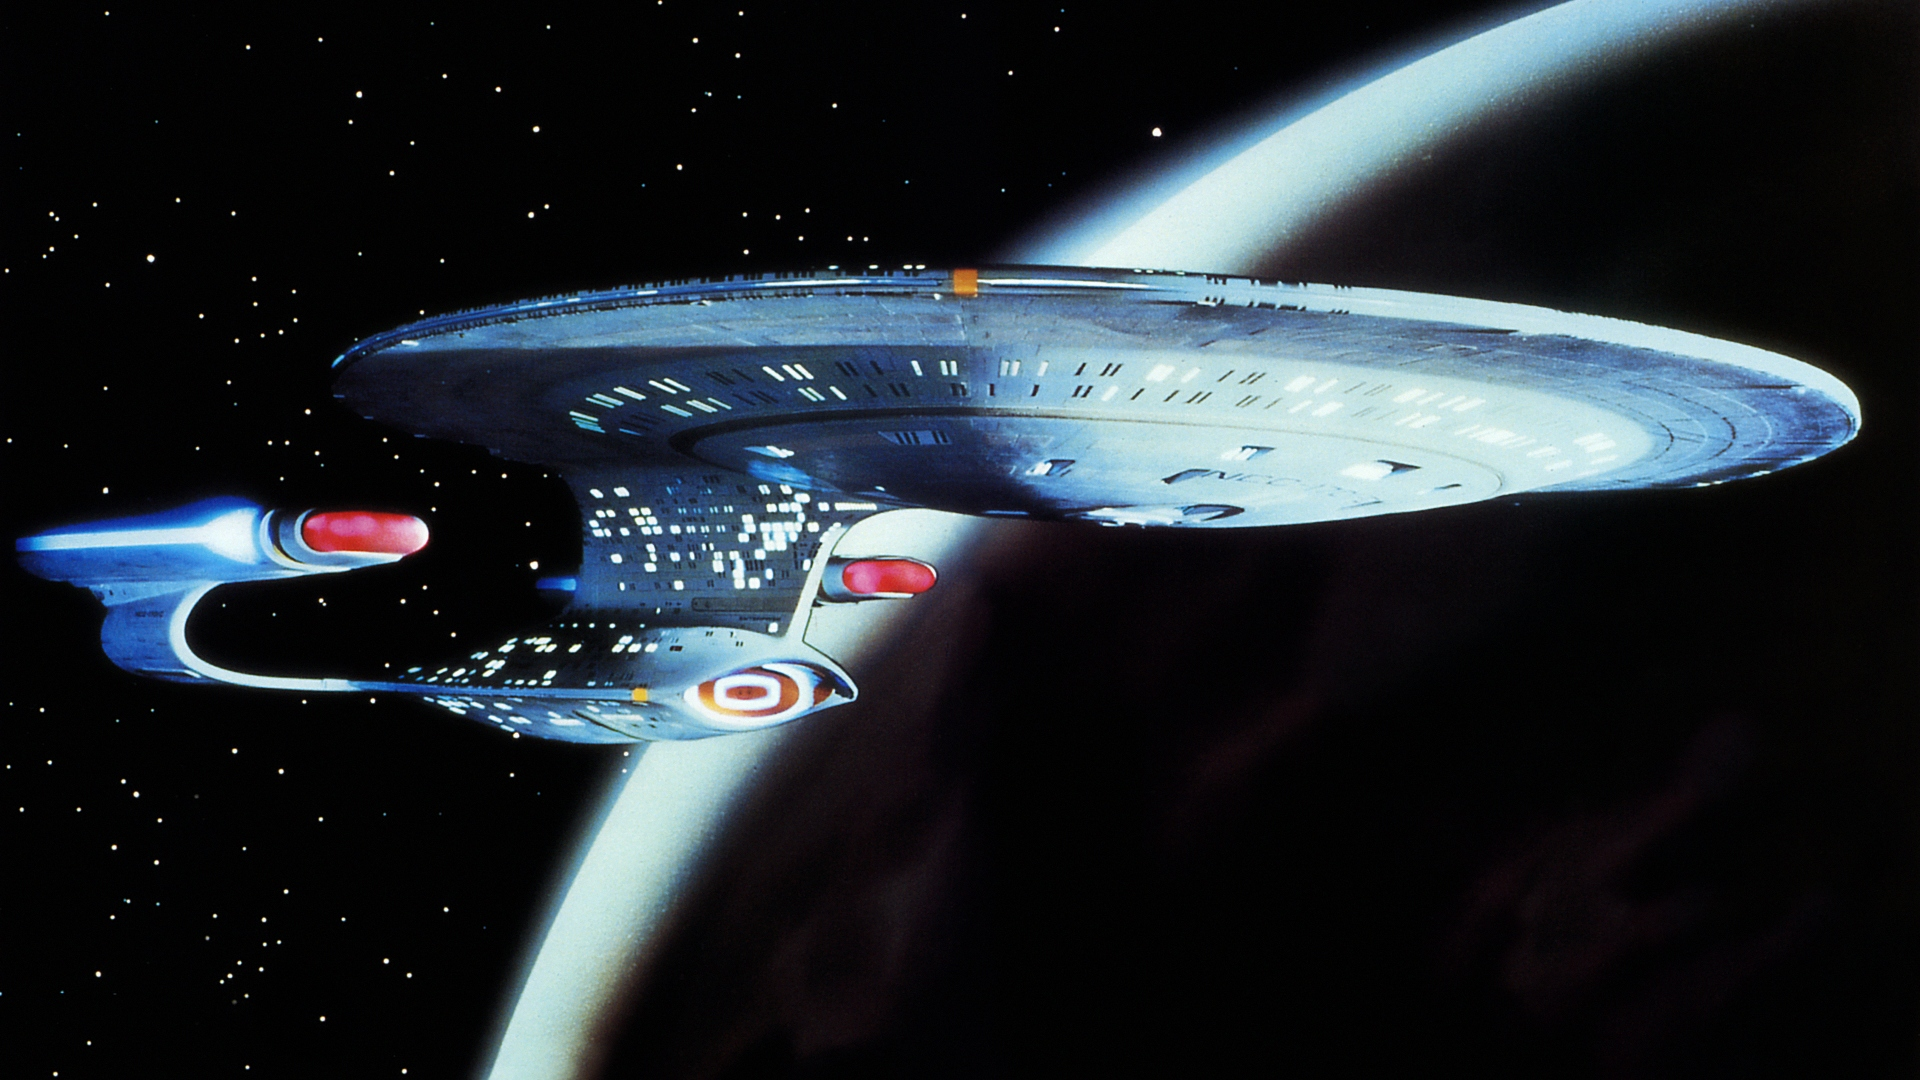 Star Trek Wallpaper 1080p ImageBankbiz 1920x1080